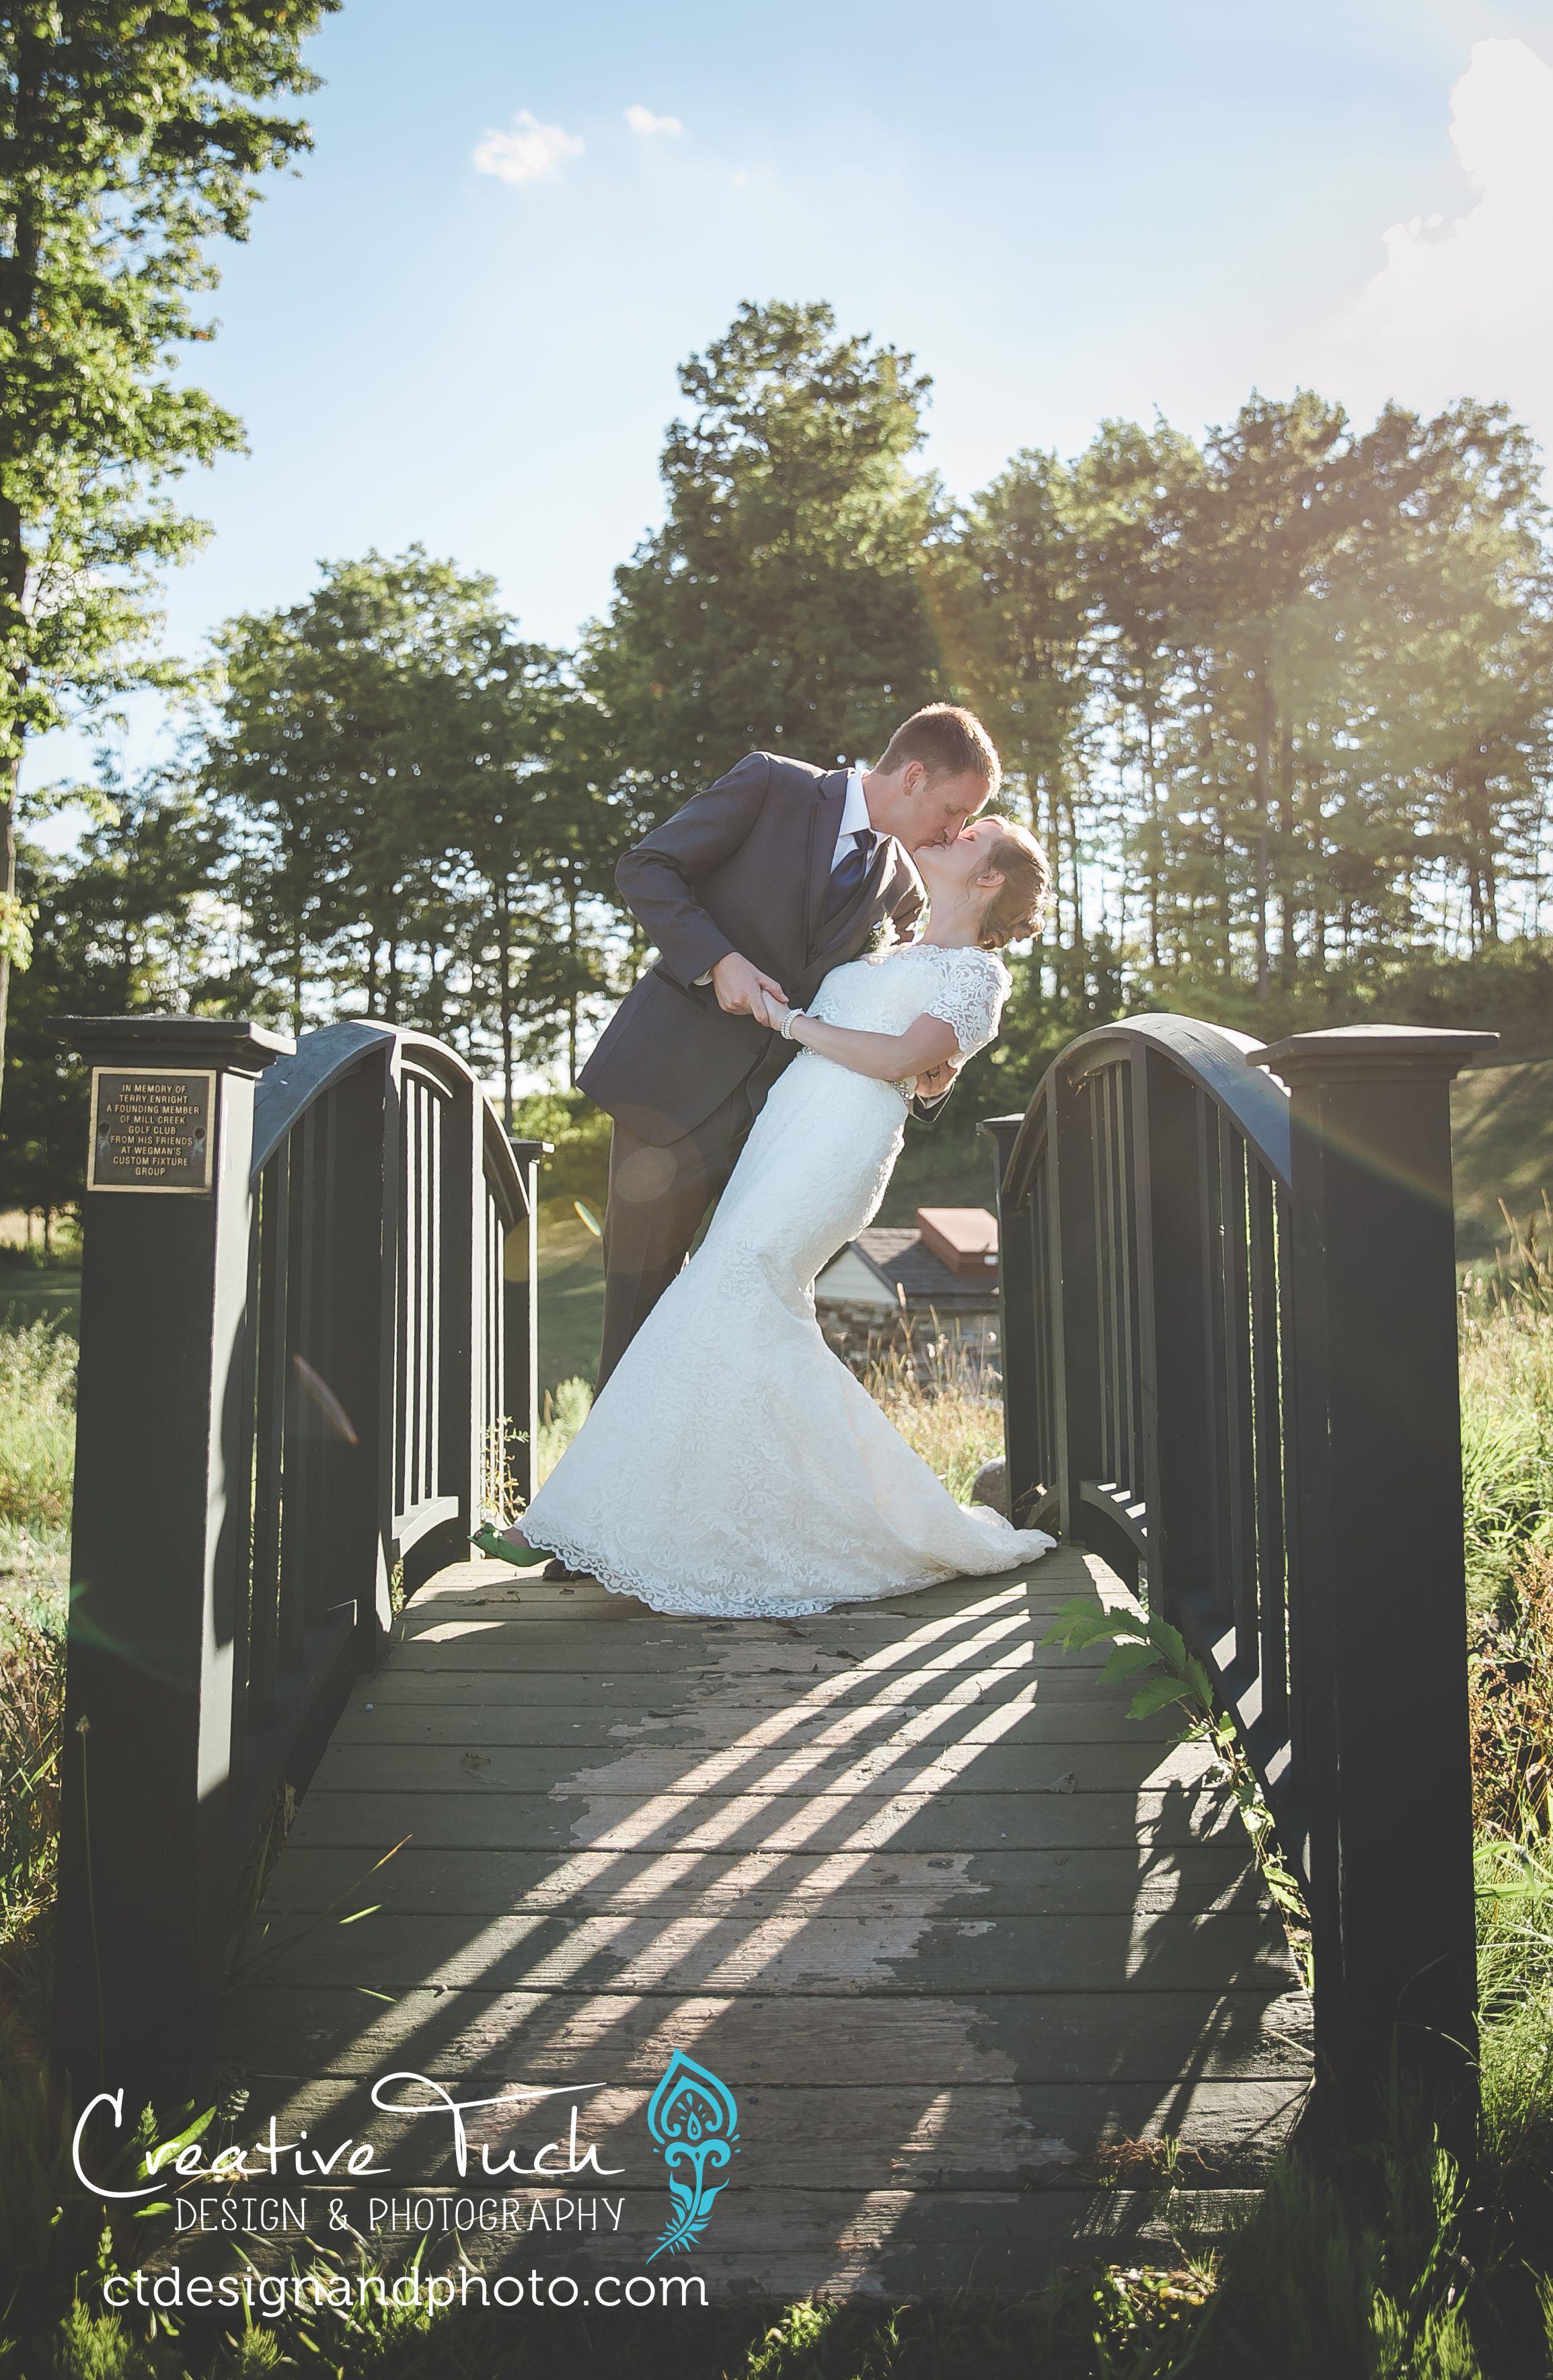 Kellogg Wedding 8 6 16 Mill Creek Golf Club Churchville Ny By